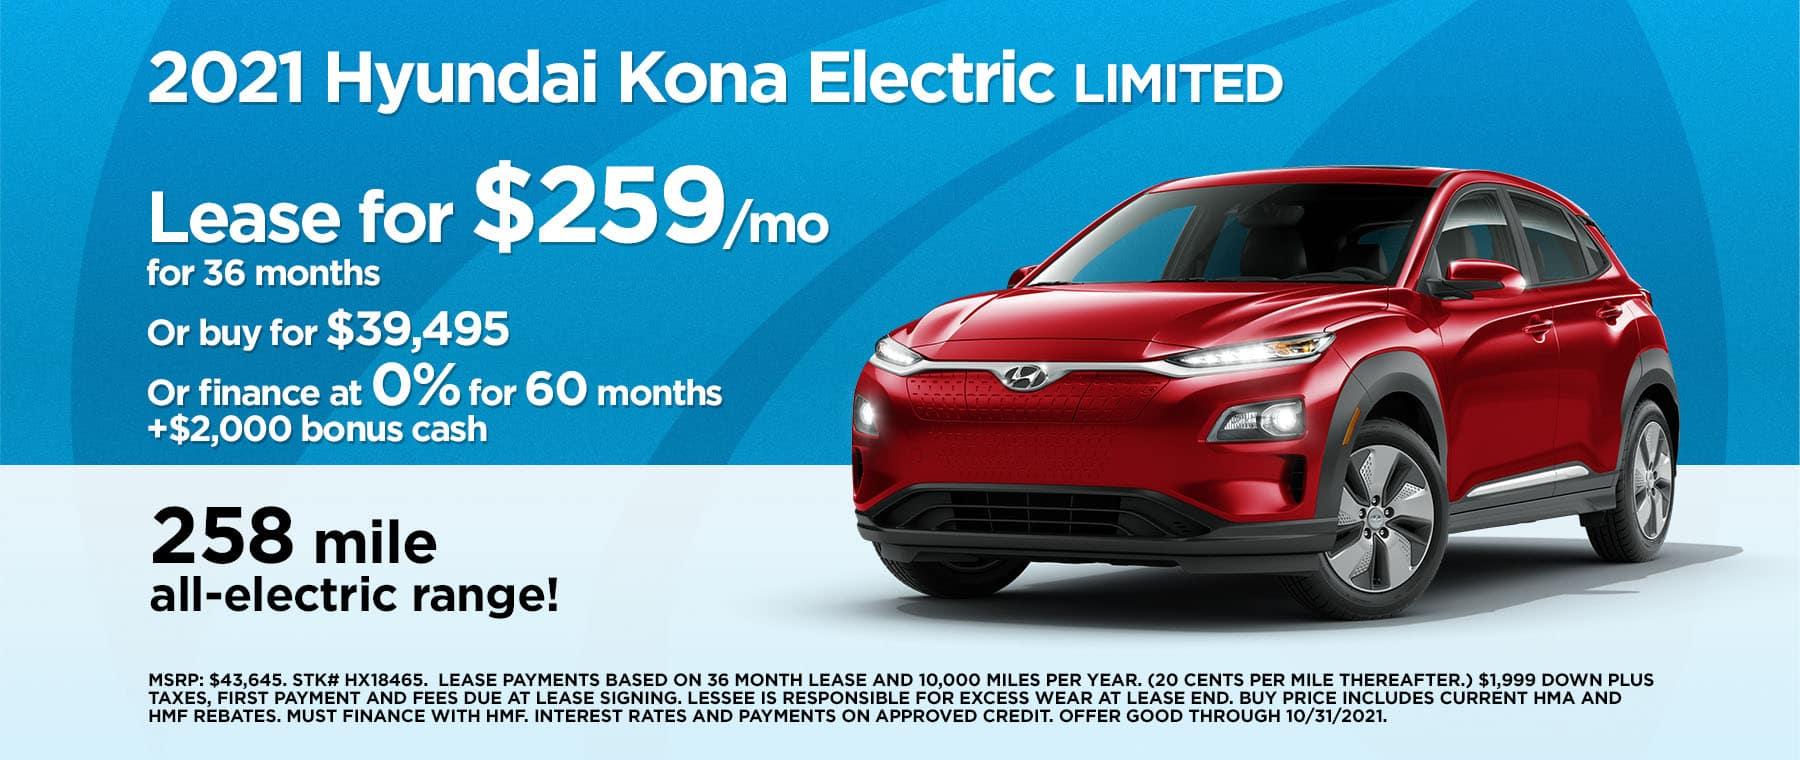 2110 Hyundai Kona Electric